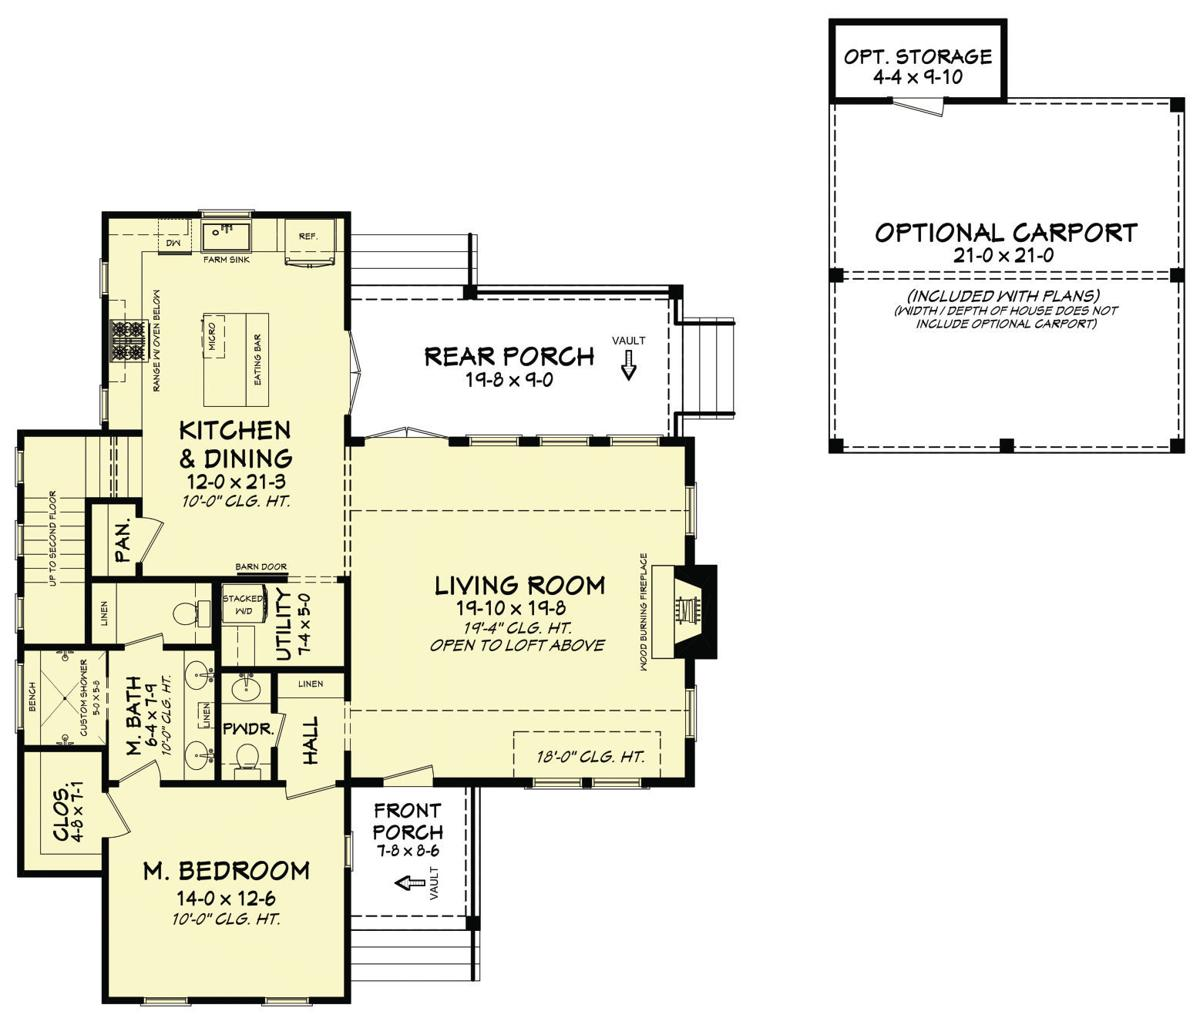 280-015 FLOOR PLAN - STAIR OPTION 4